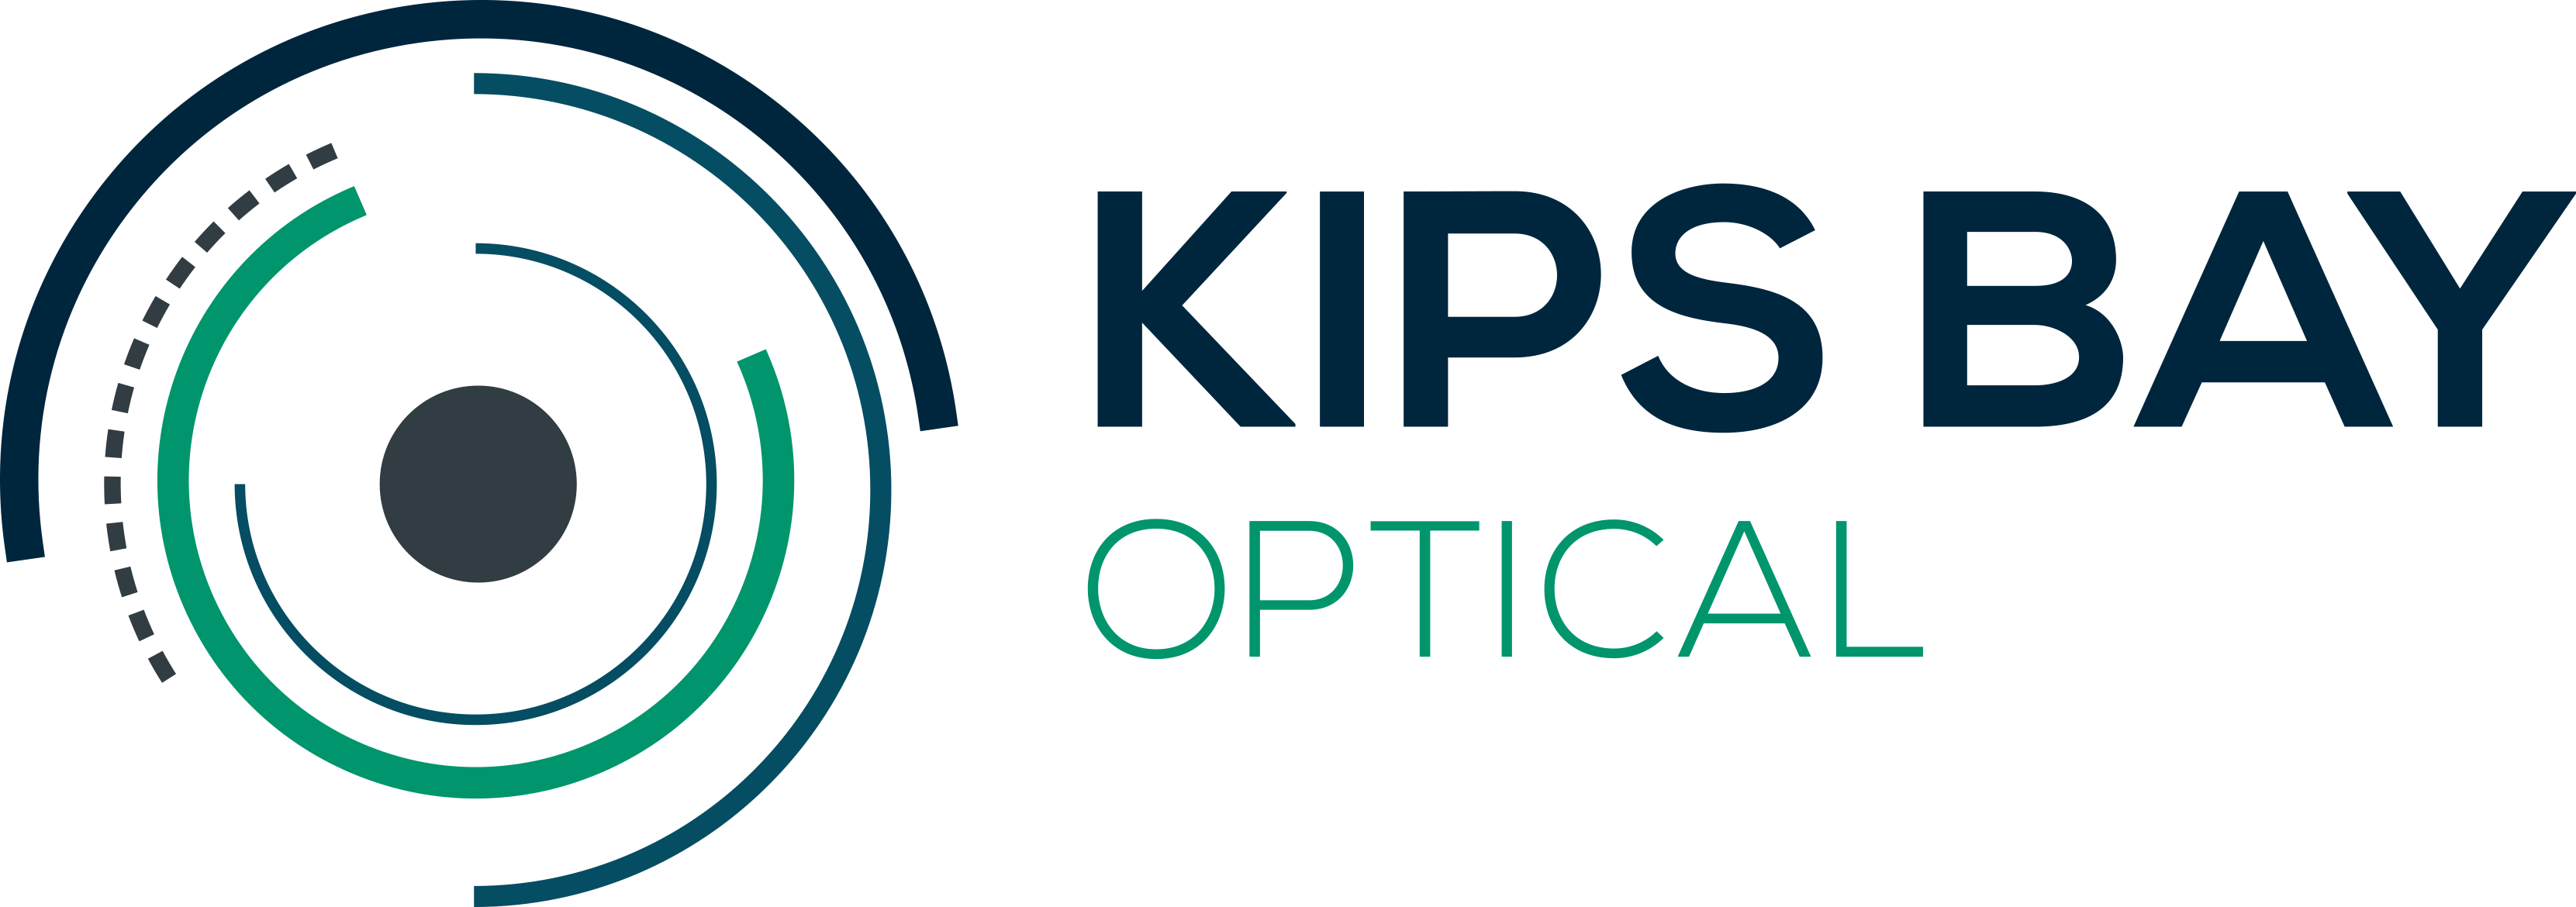 Kips Bay Optical